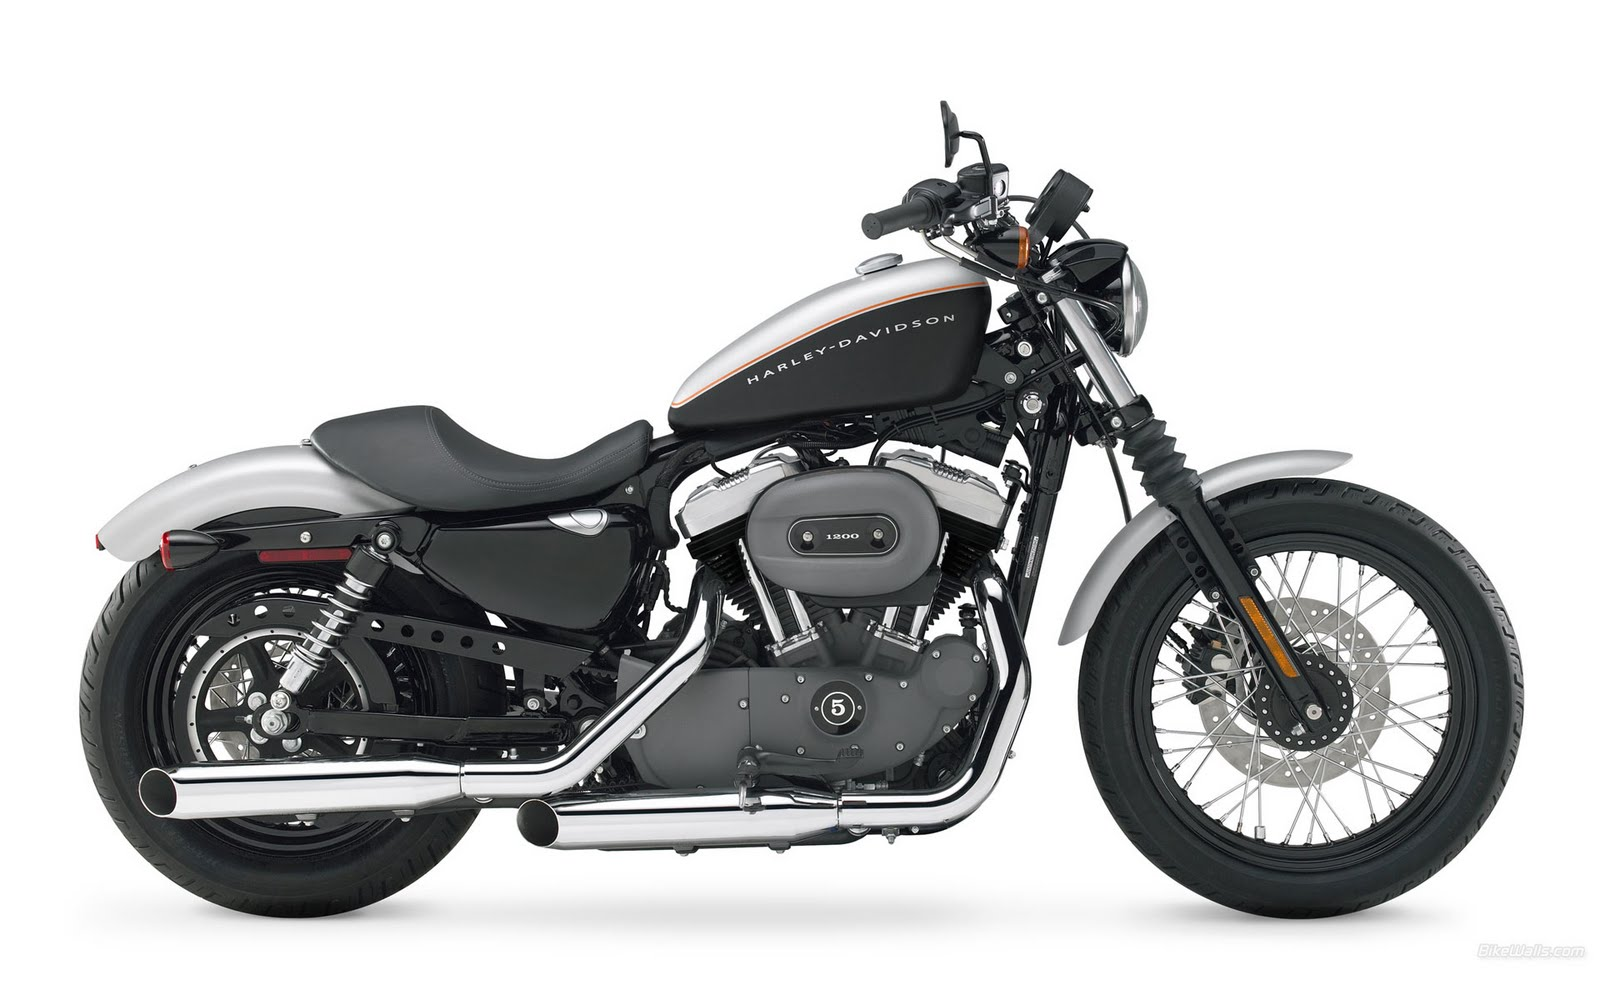 Harley-Davidson Sportster 1200 Nightster